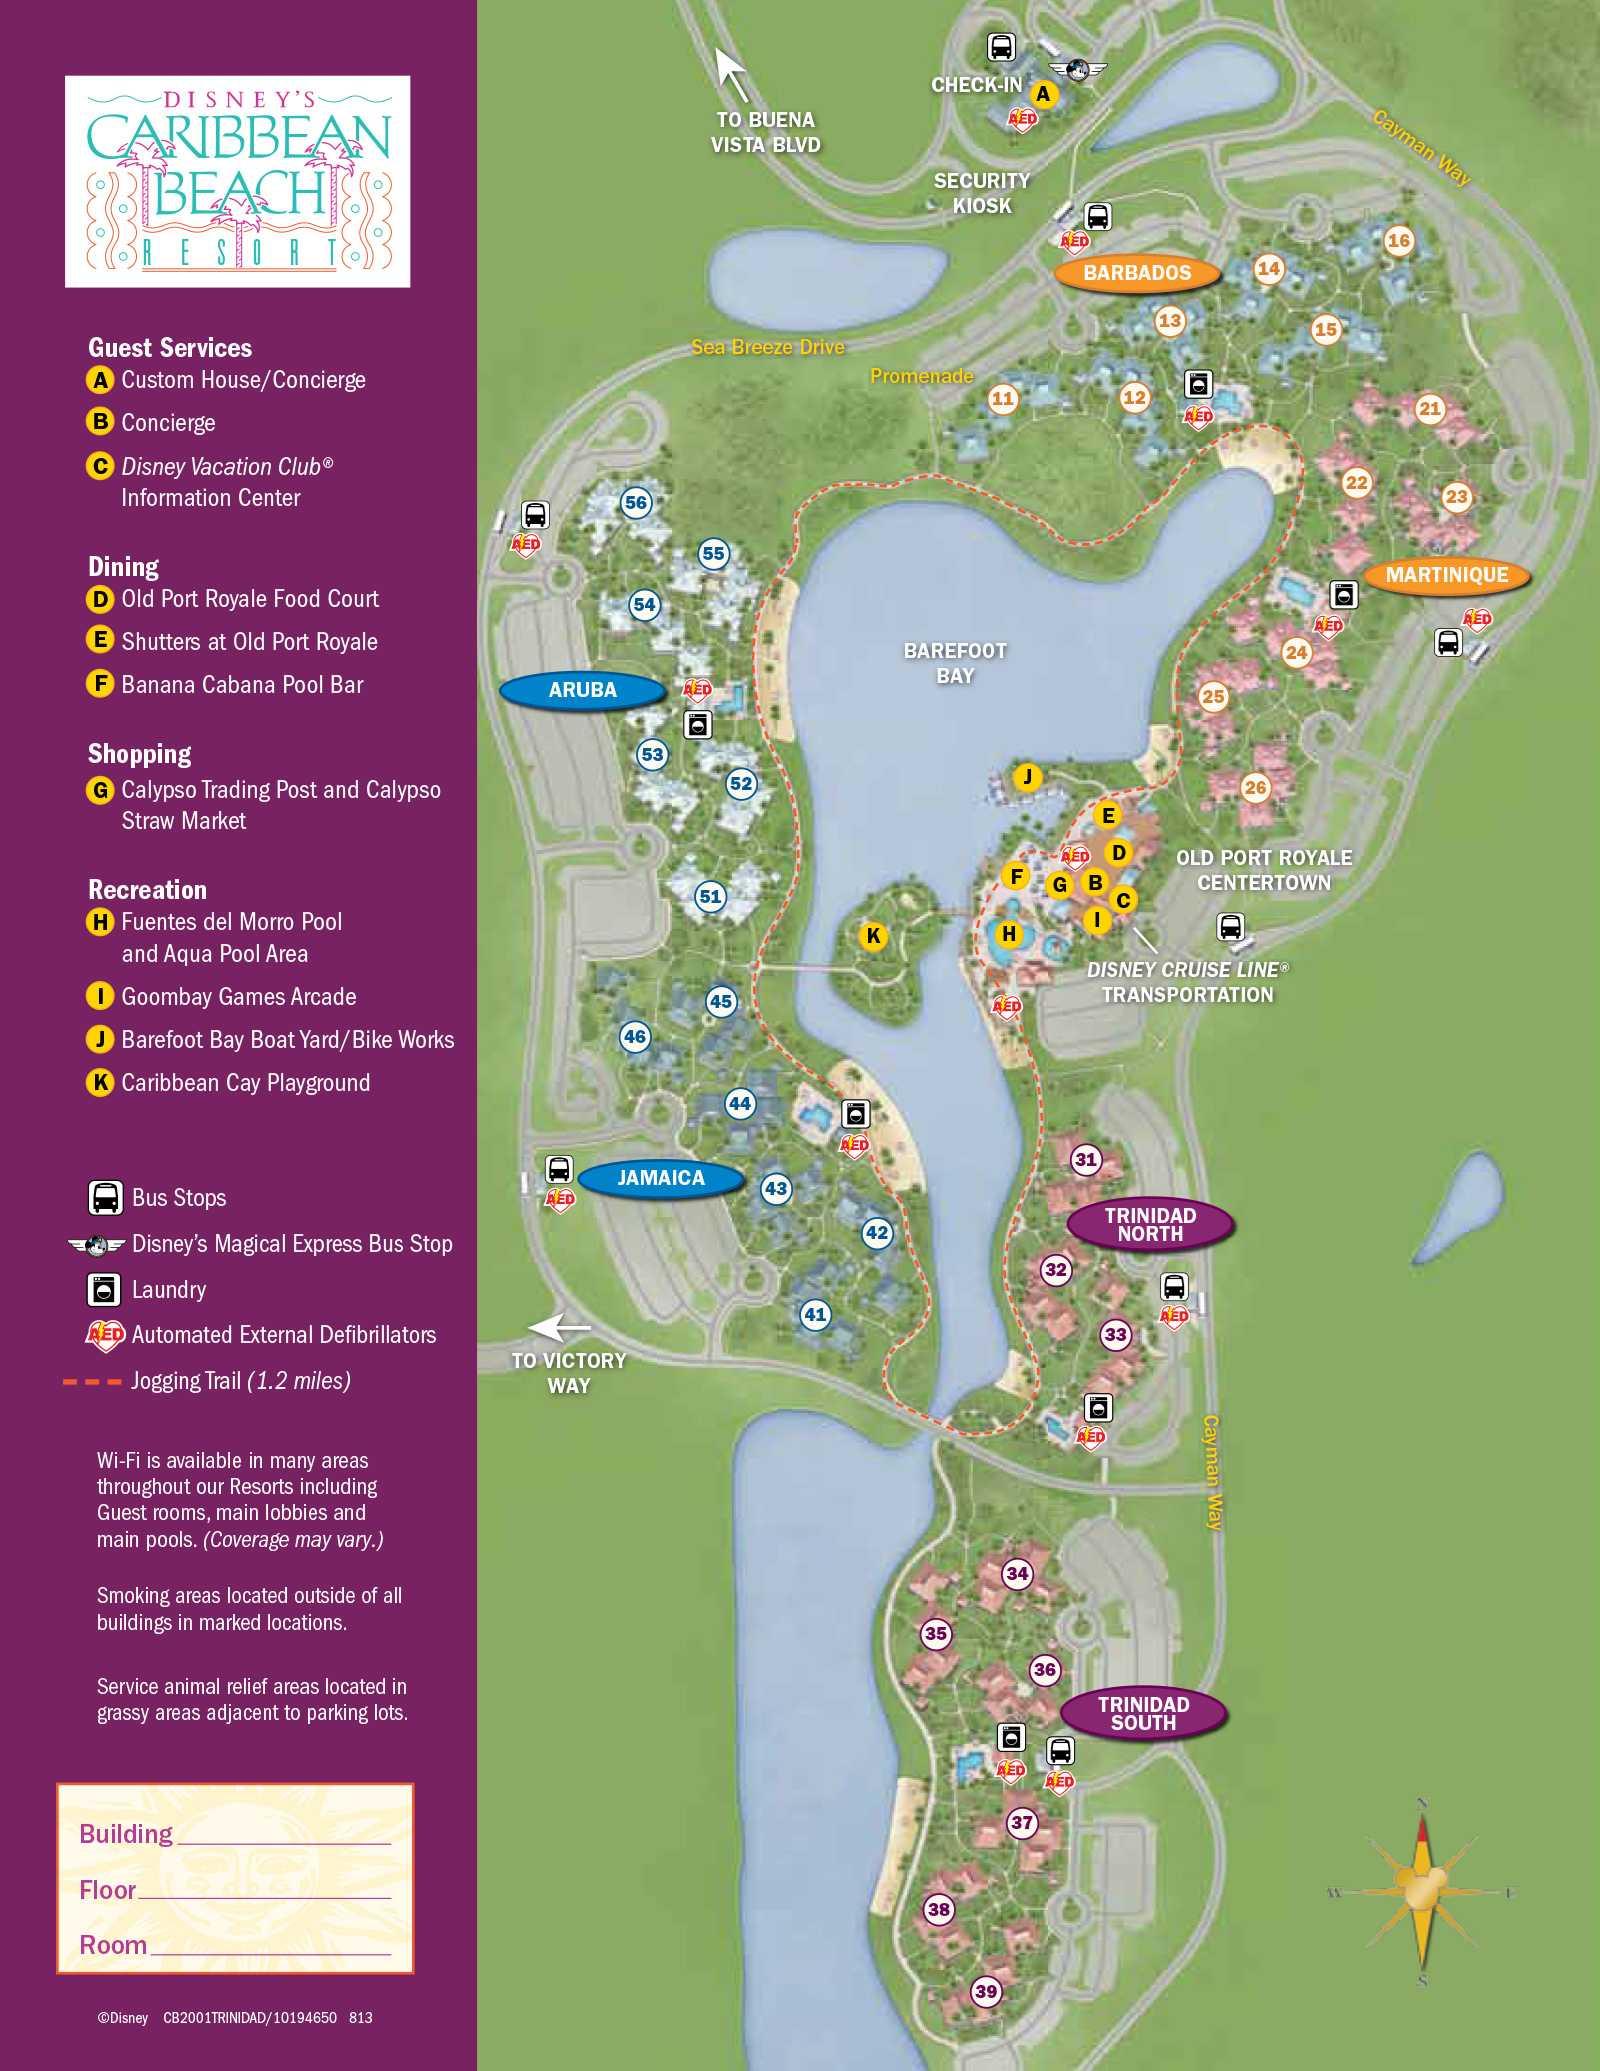 2013 Caribbean Beach Resort guide map - Photo 5 of 6